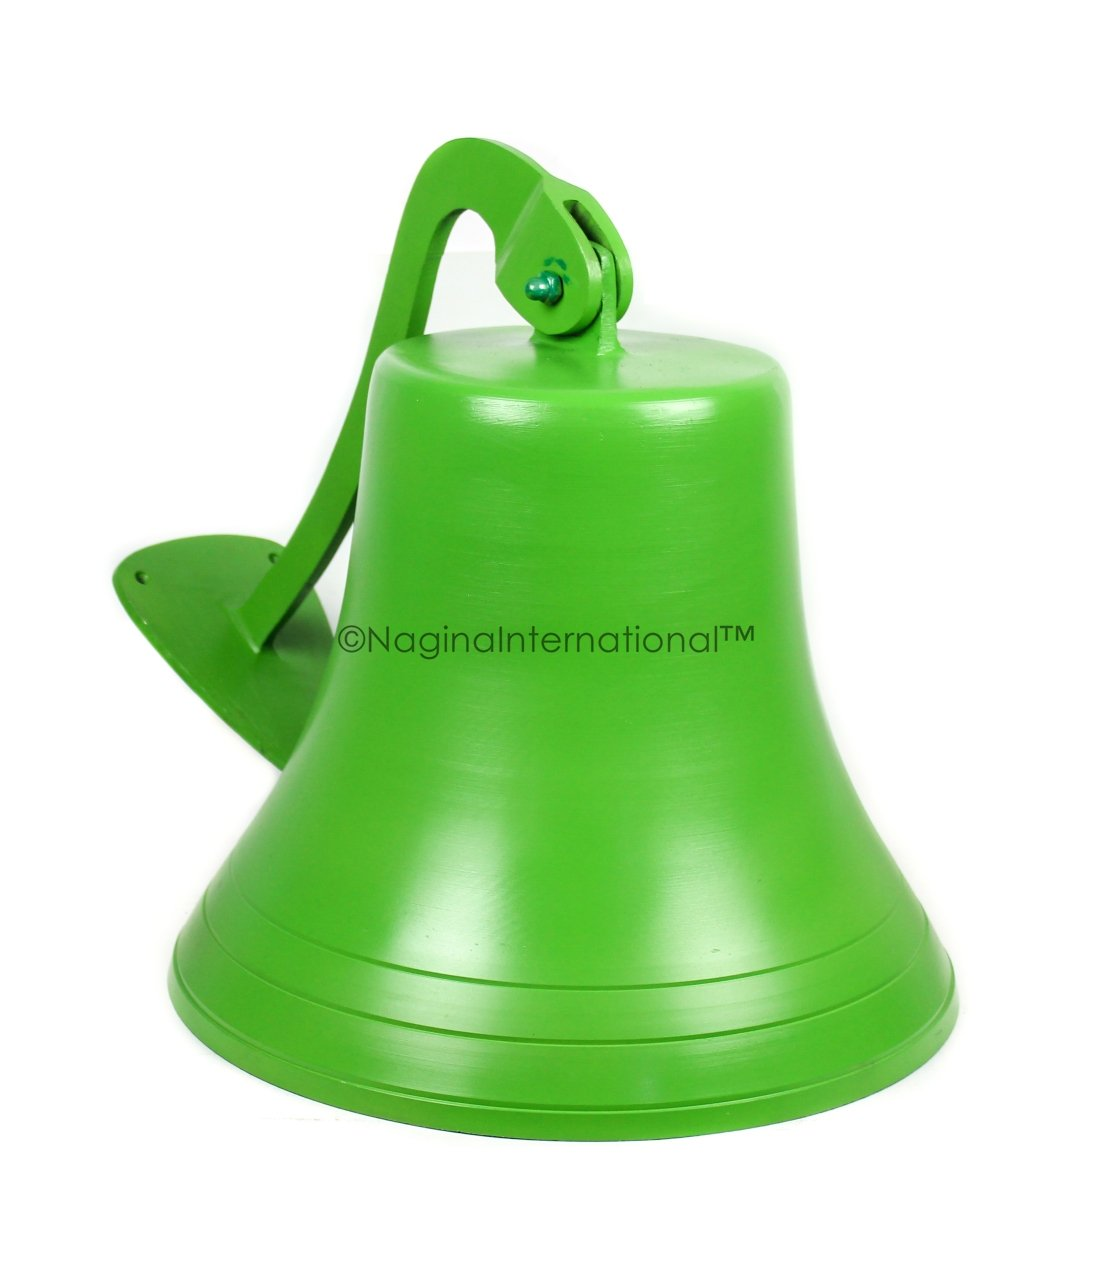 Navy's Nautical Ship's Aluminum Cast Premium Bell | Nursery Decor Gifts | Nagina International … (15 Inches, Green) by Nagina International